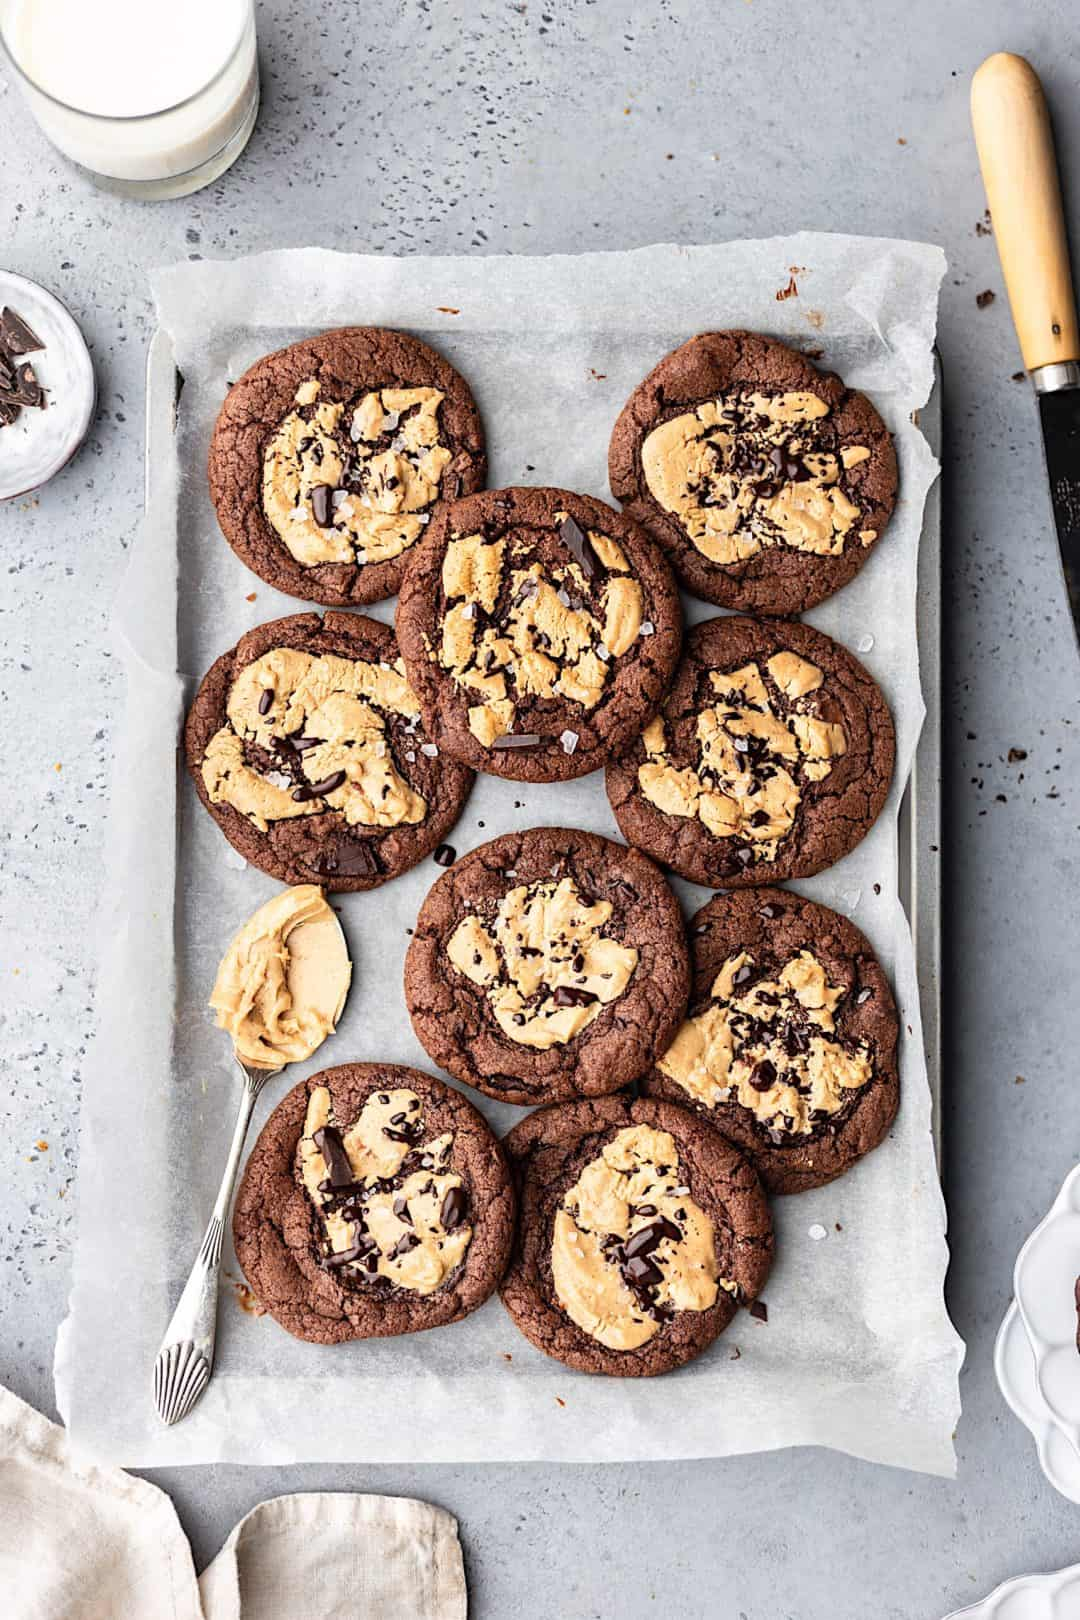 Vegan Chocolate Peanut Butter Cookies #recipe #vegan #cookies #peanutbutter #chocolate